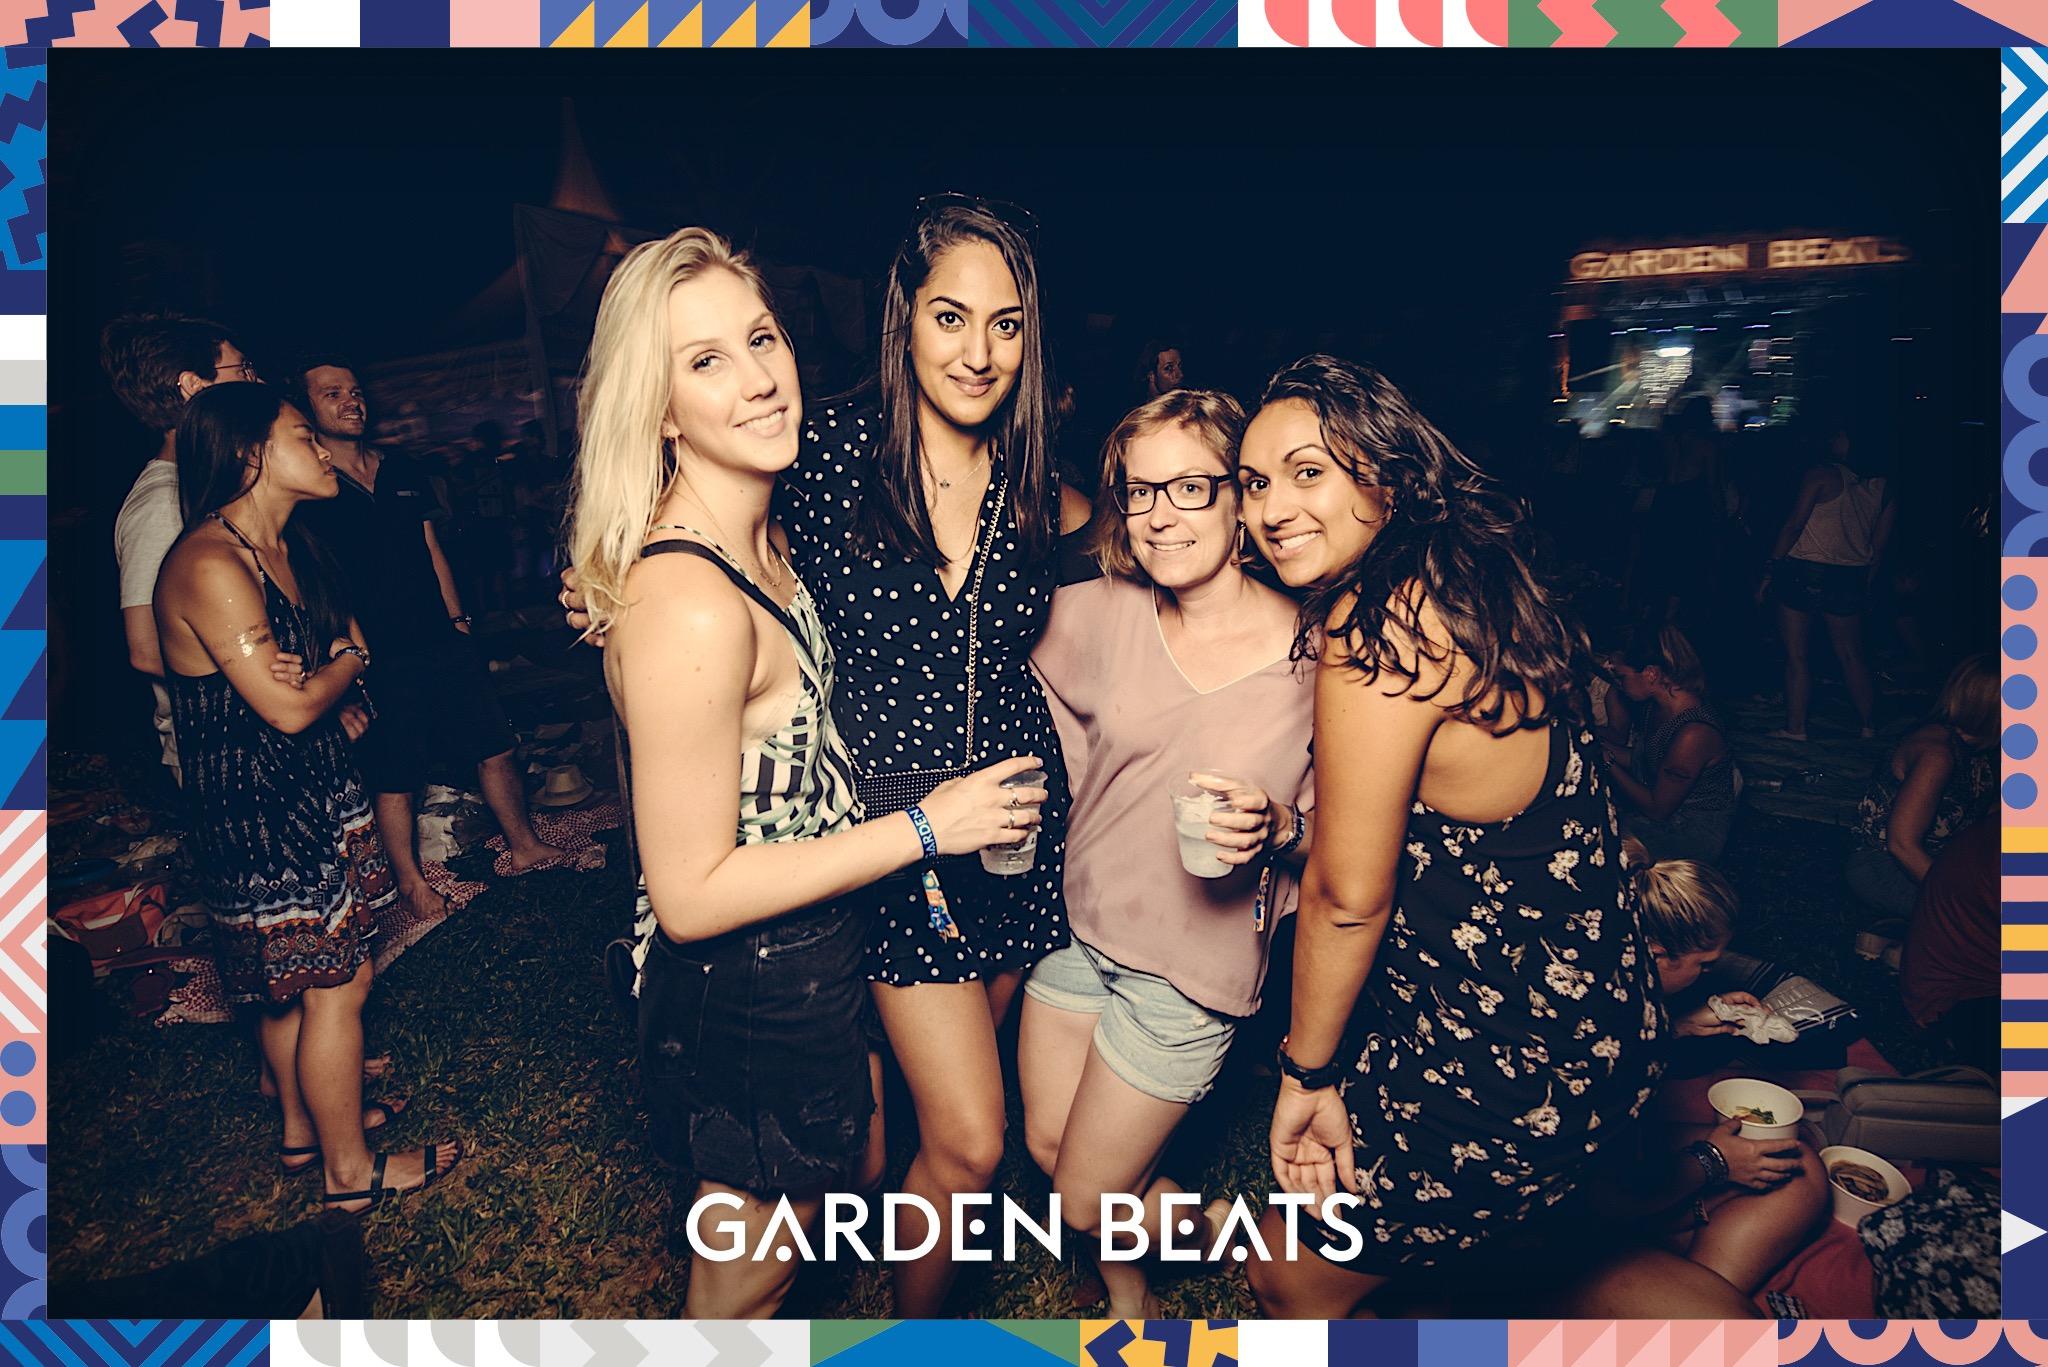 18032017_GardenBeats_Colossal777_WatermarkedGB.jpg